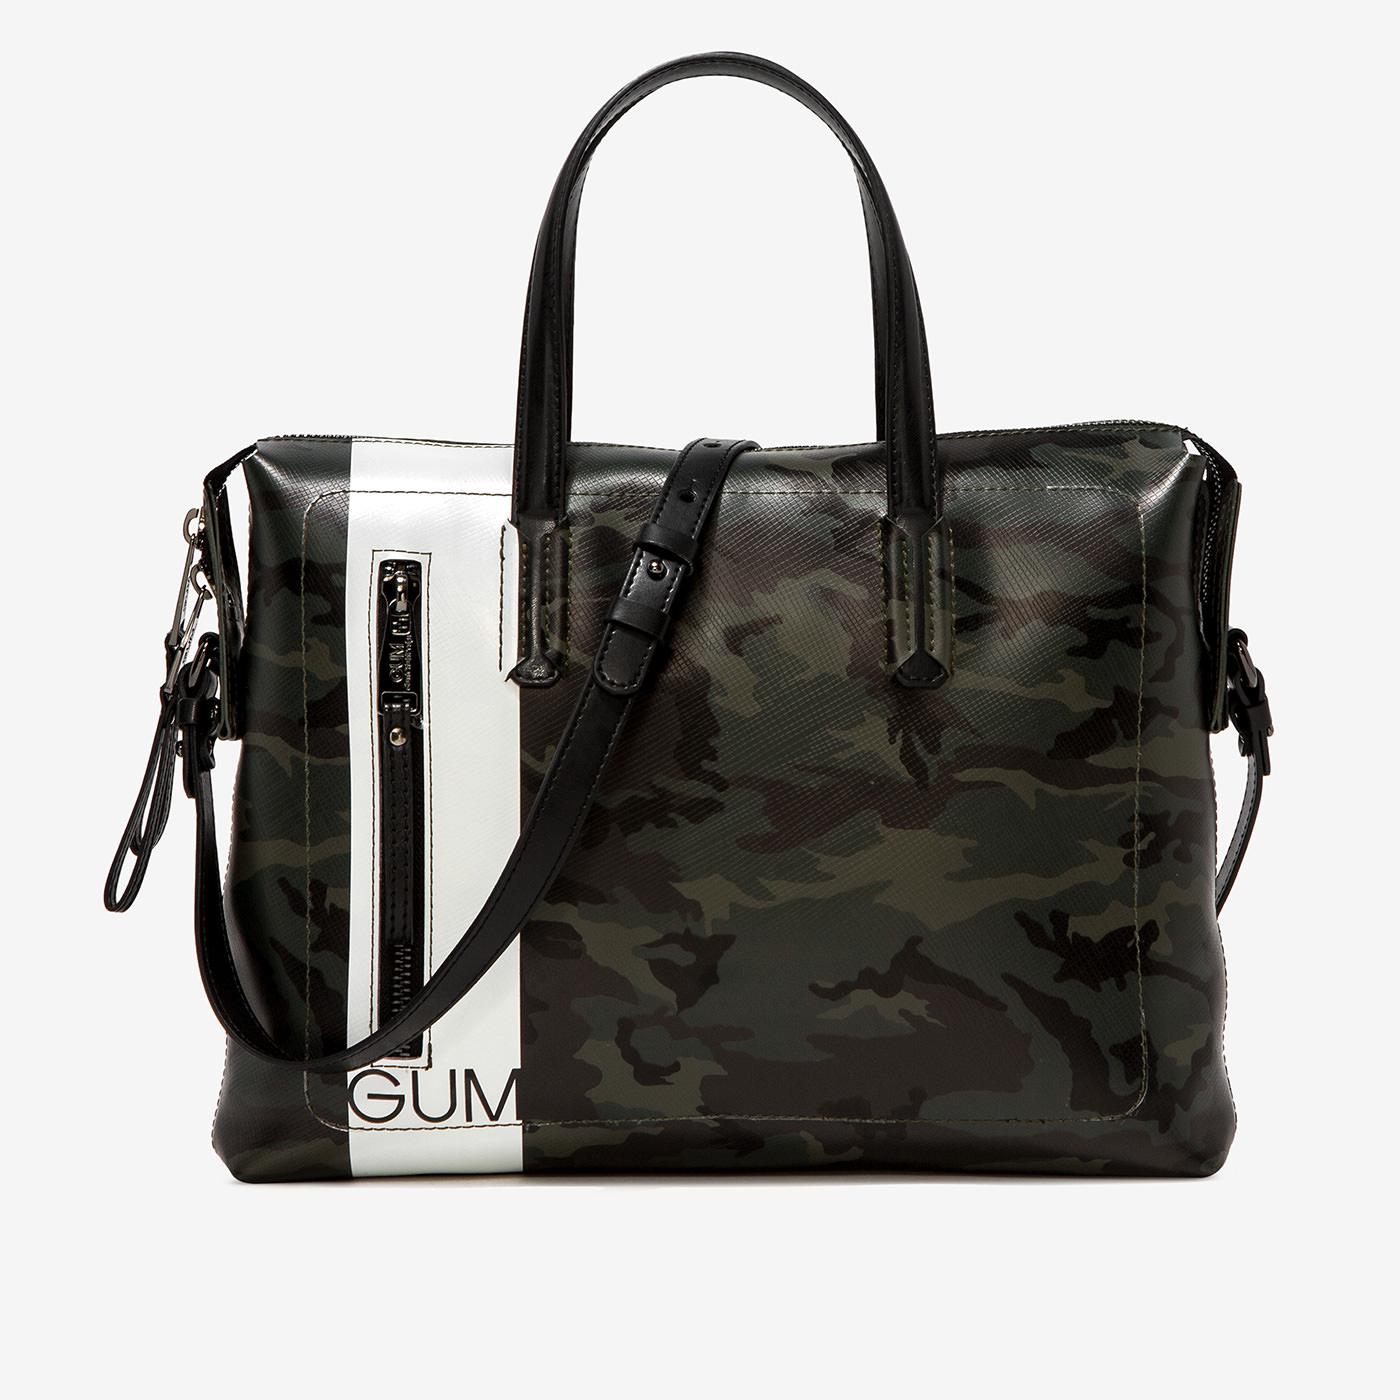 GUM: CAMUACTIVE PATTERN BUSINESS BAG